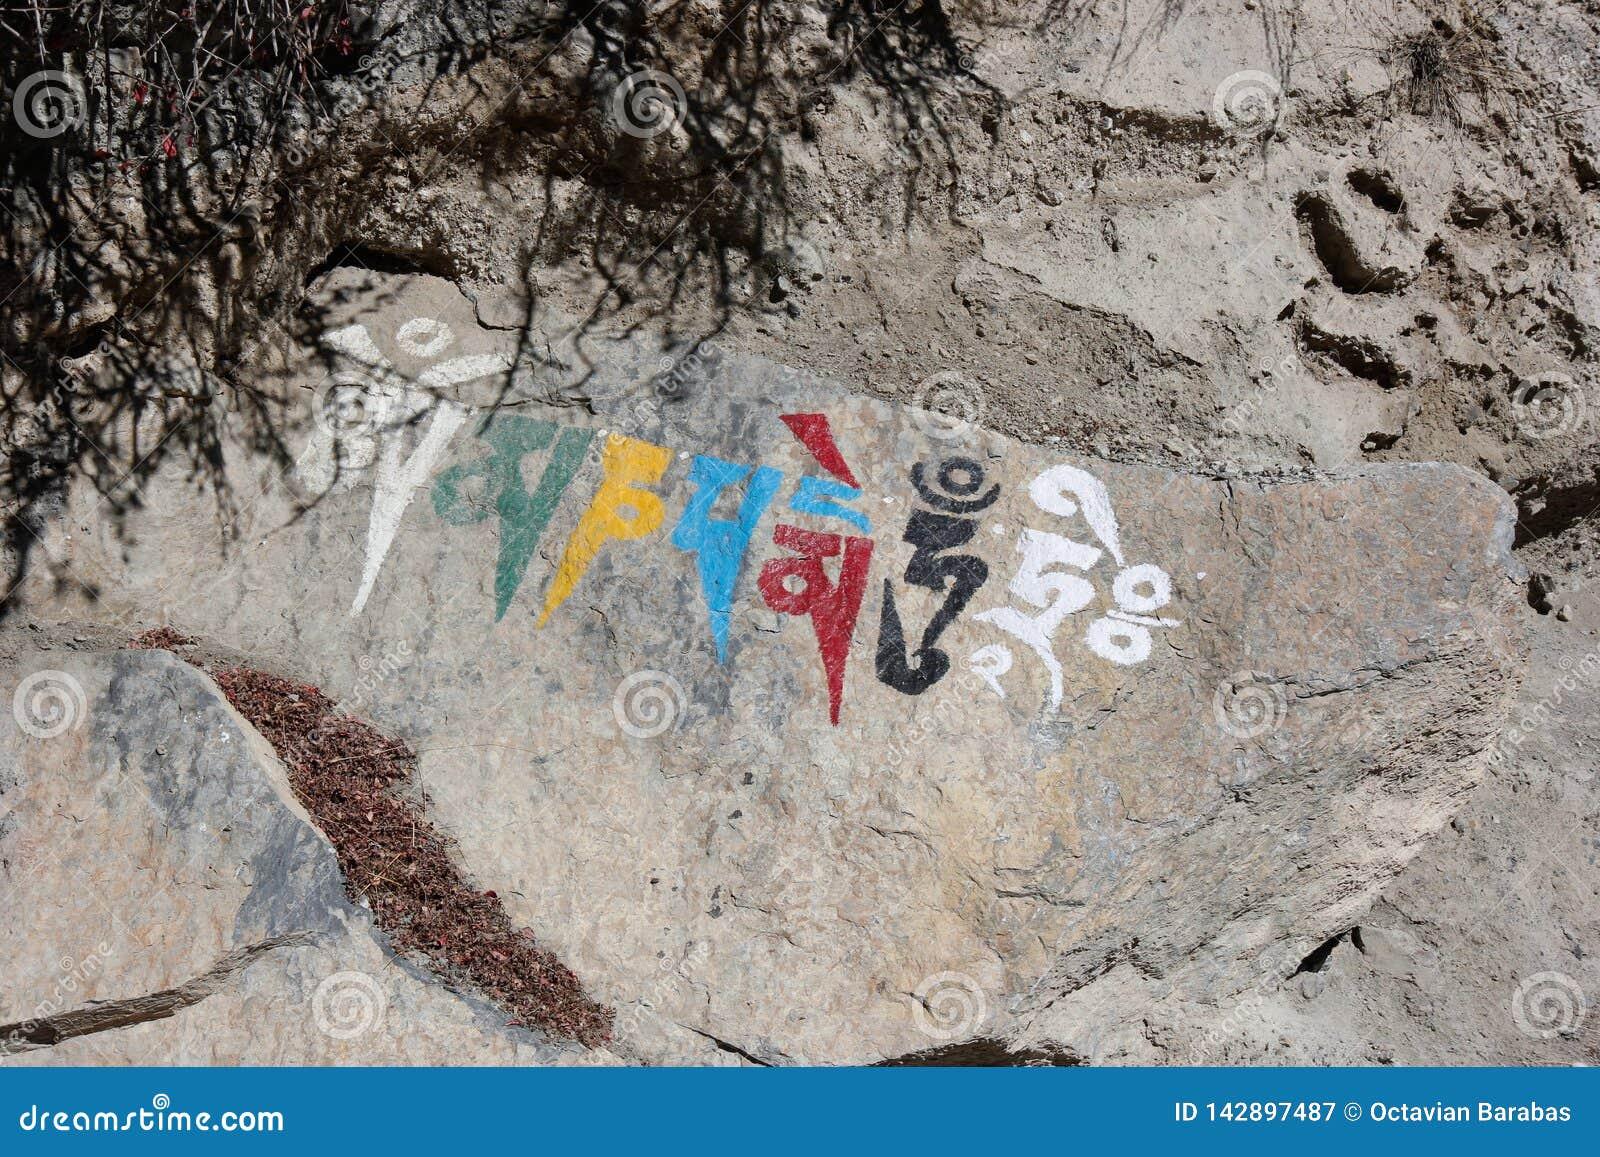 Nepalski religijny symbol pisze na skale